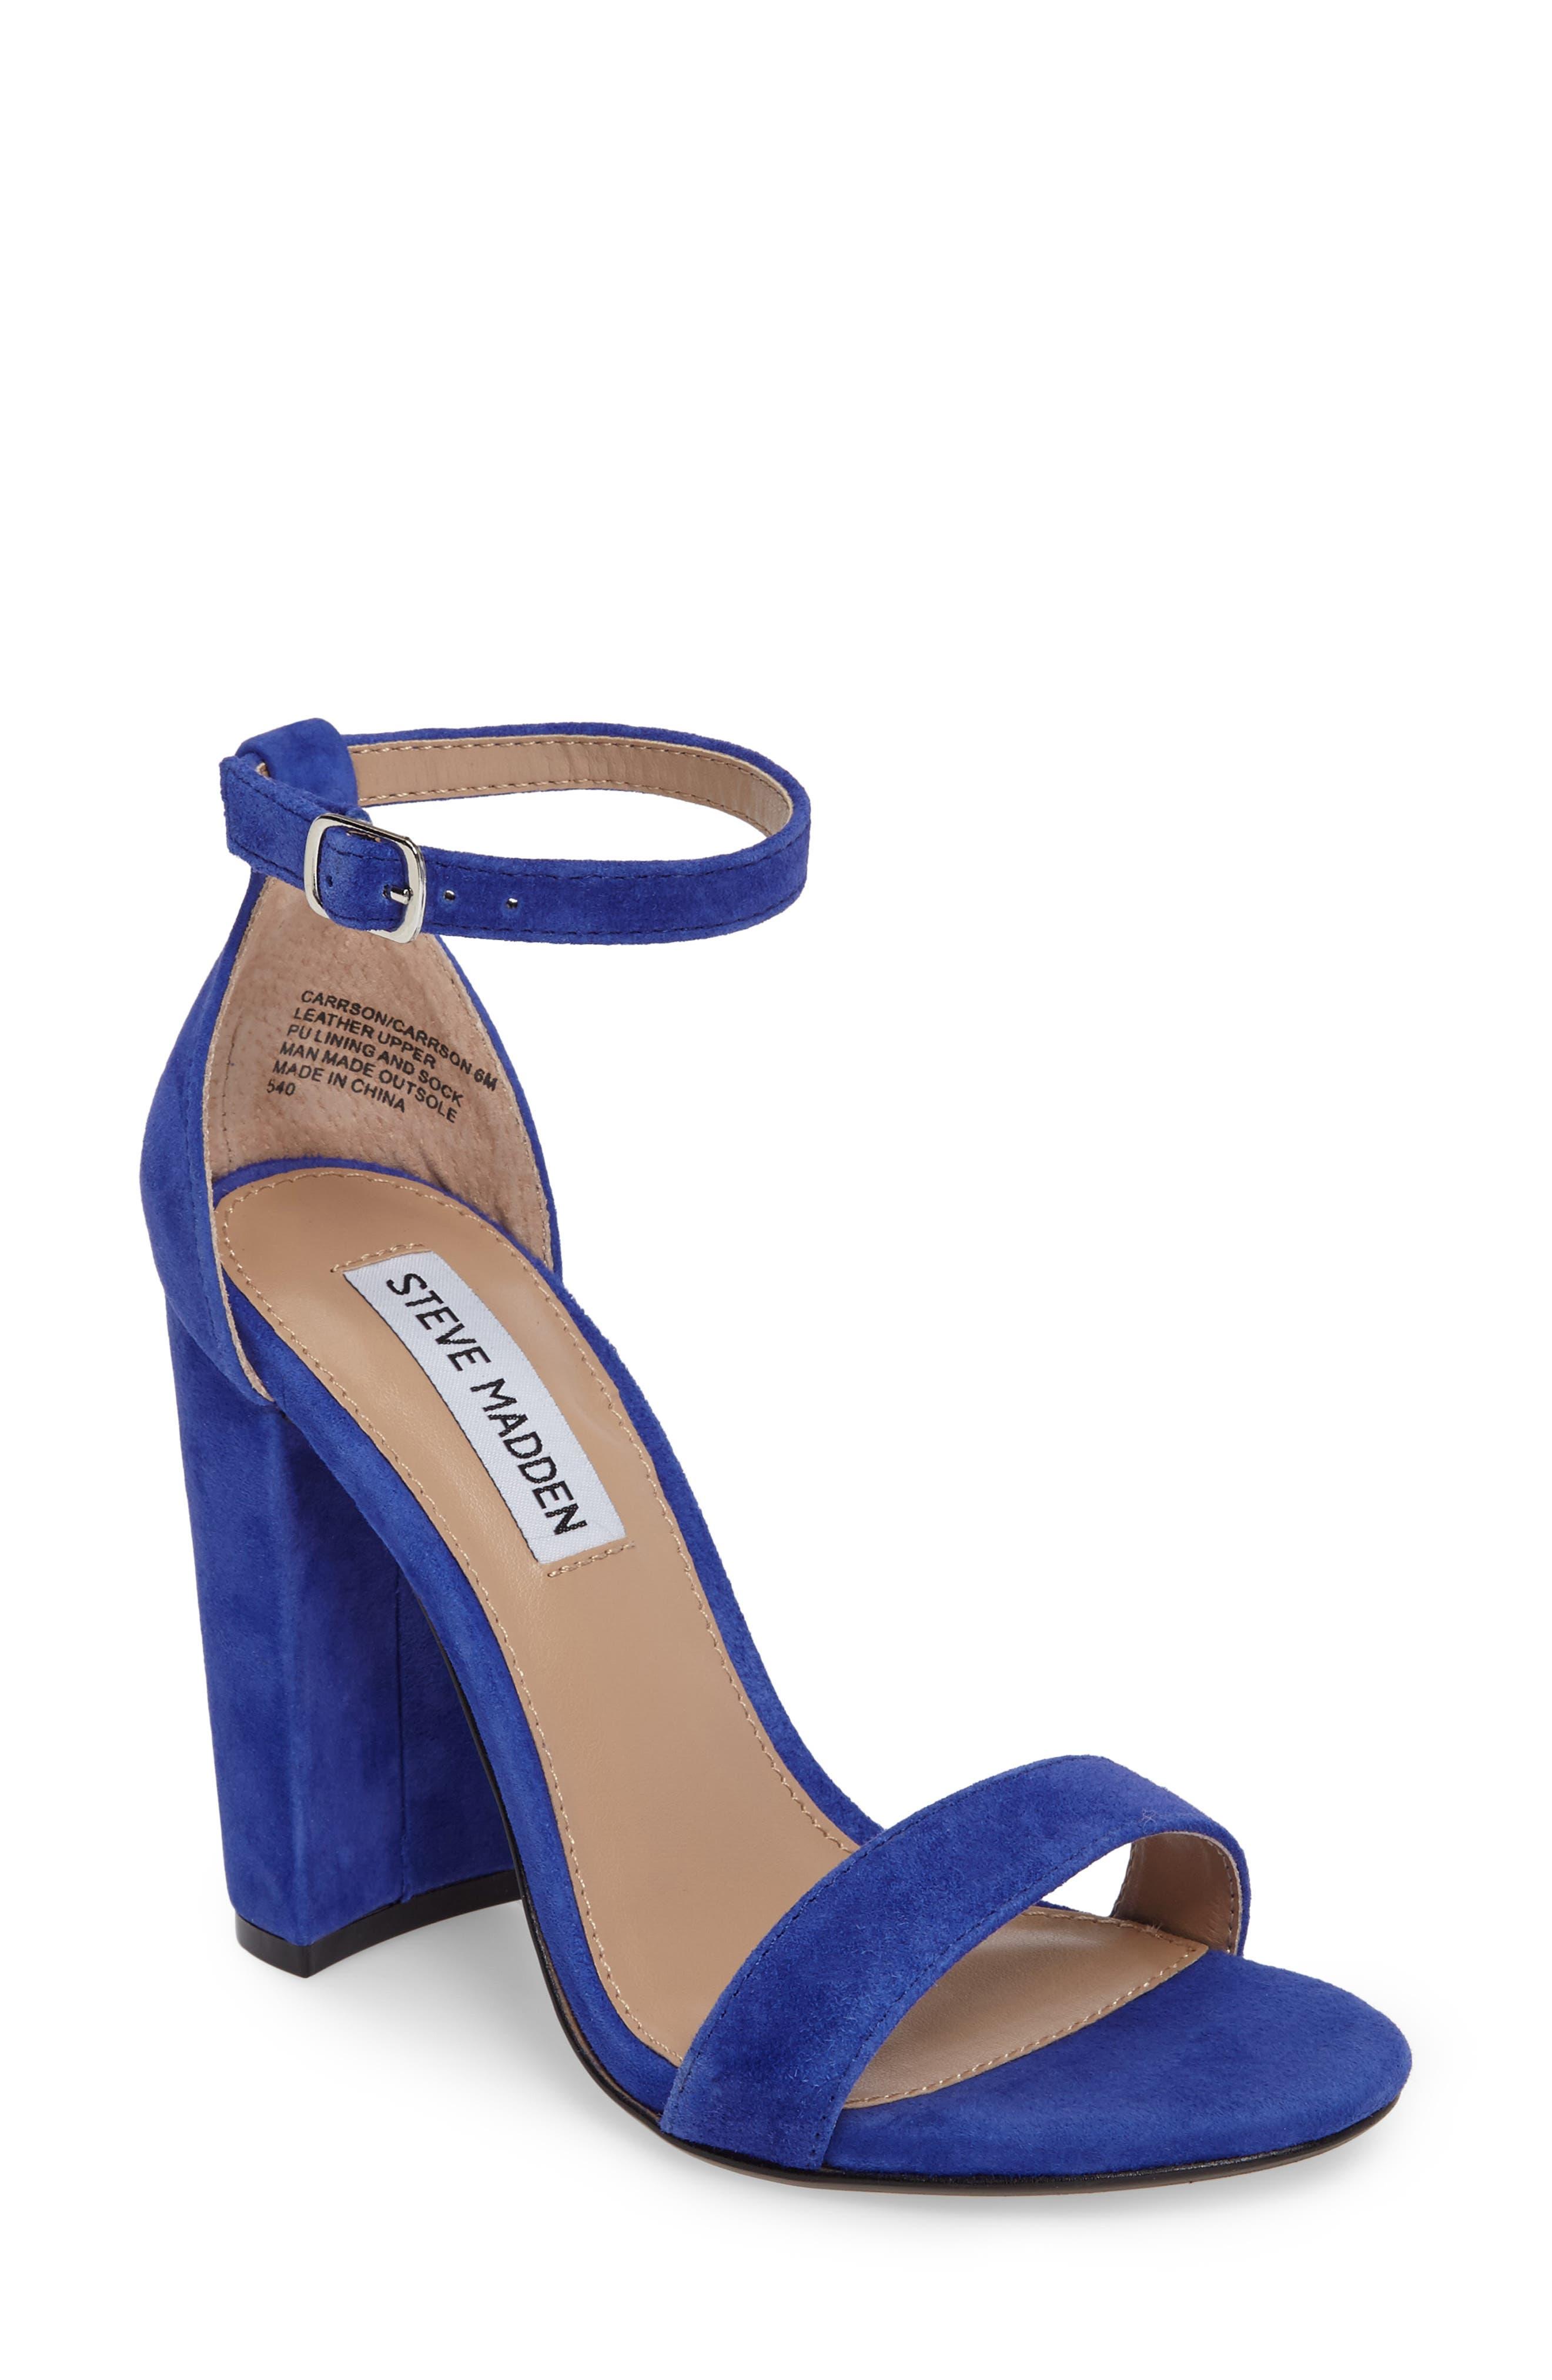 Blue Block Heels H8nDW9zP